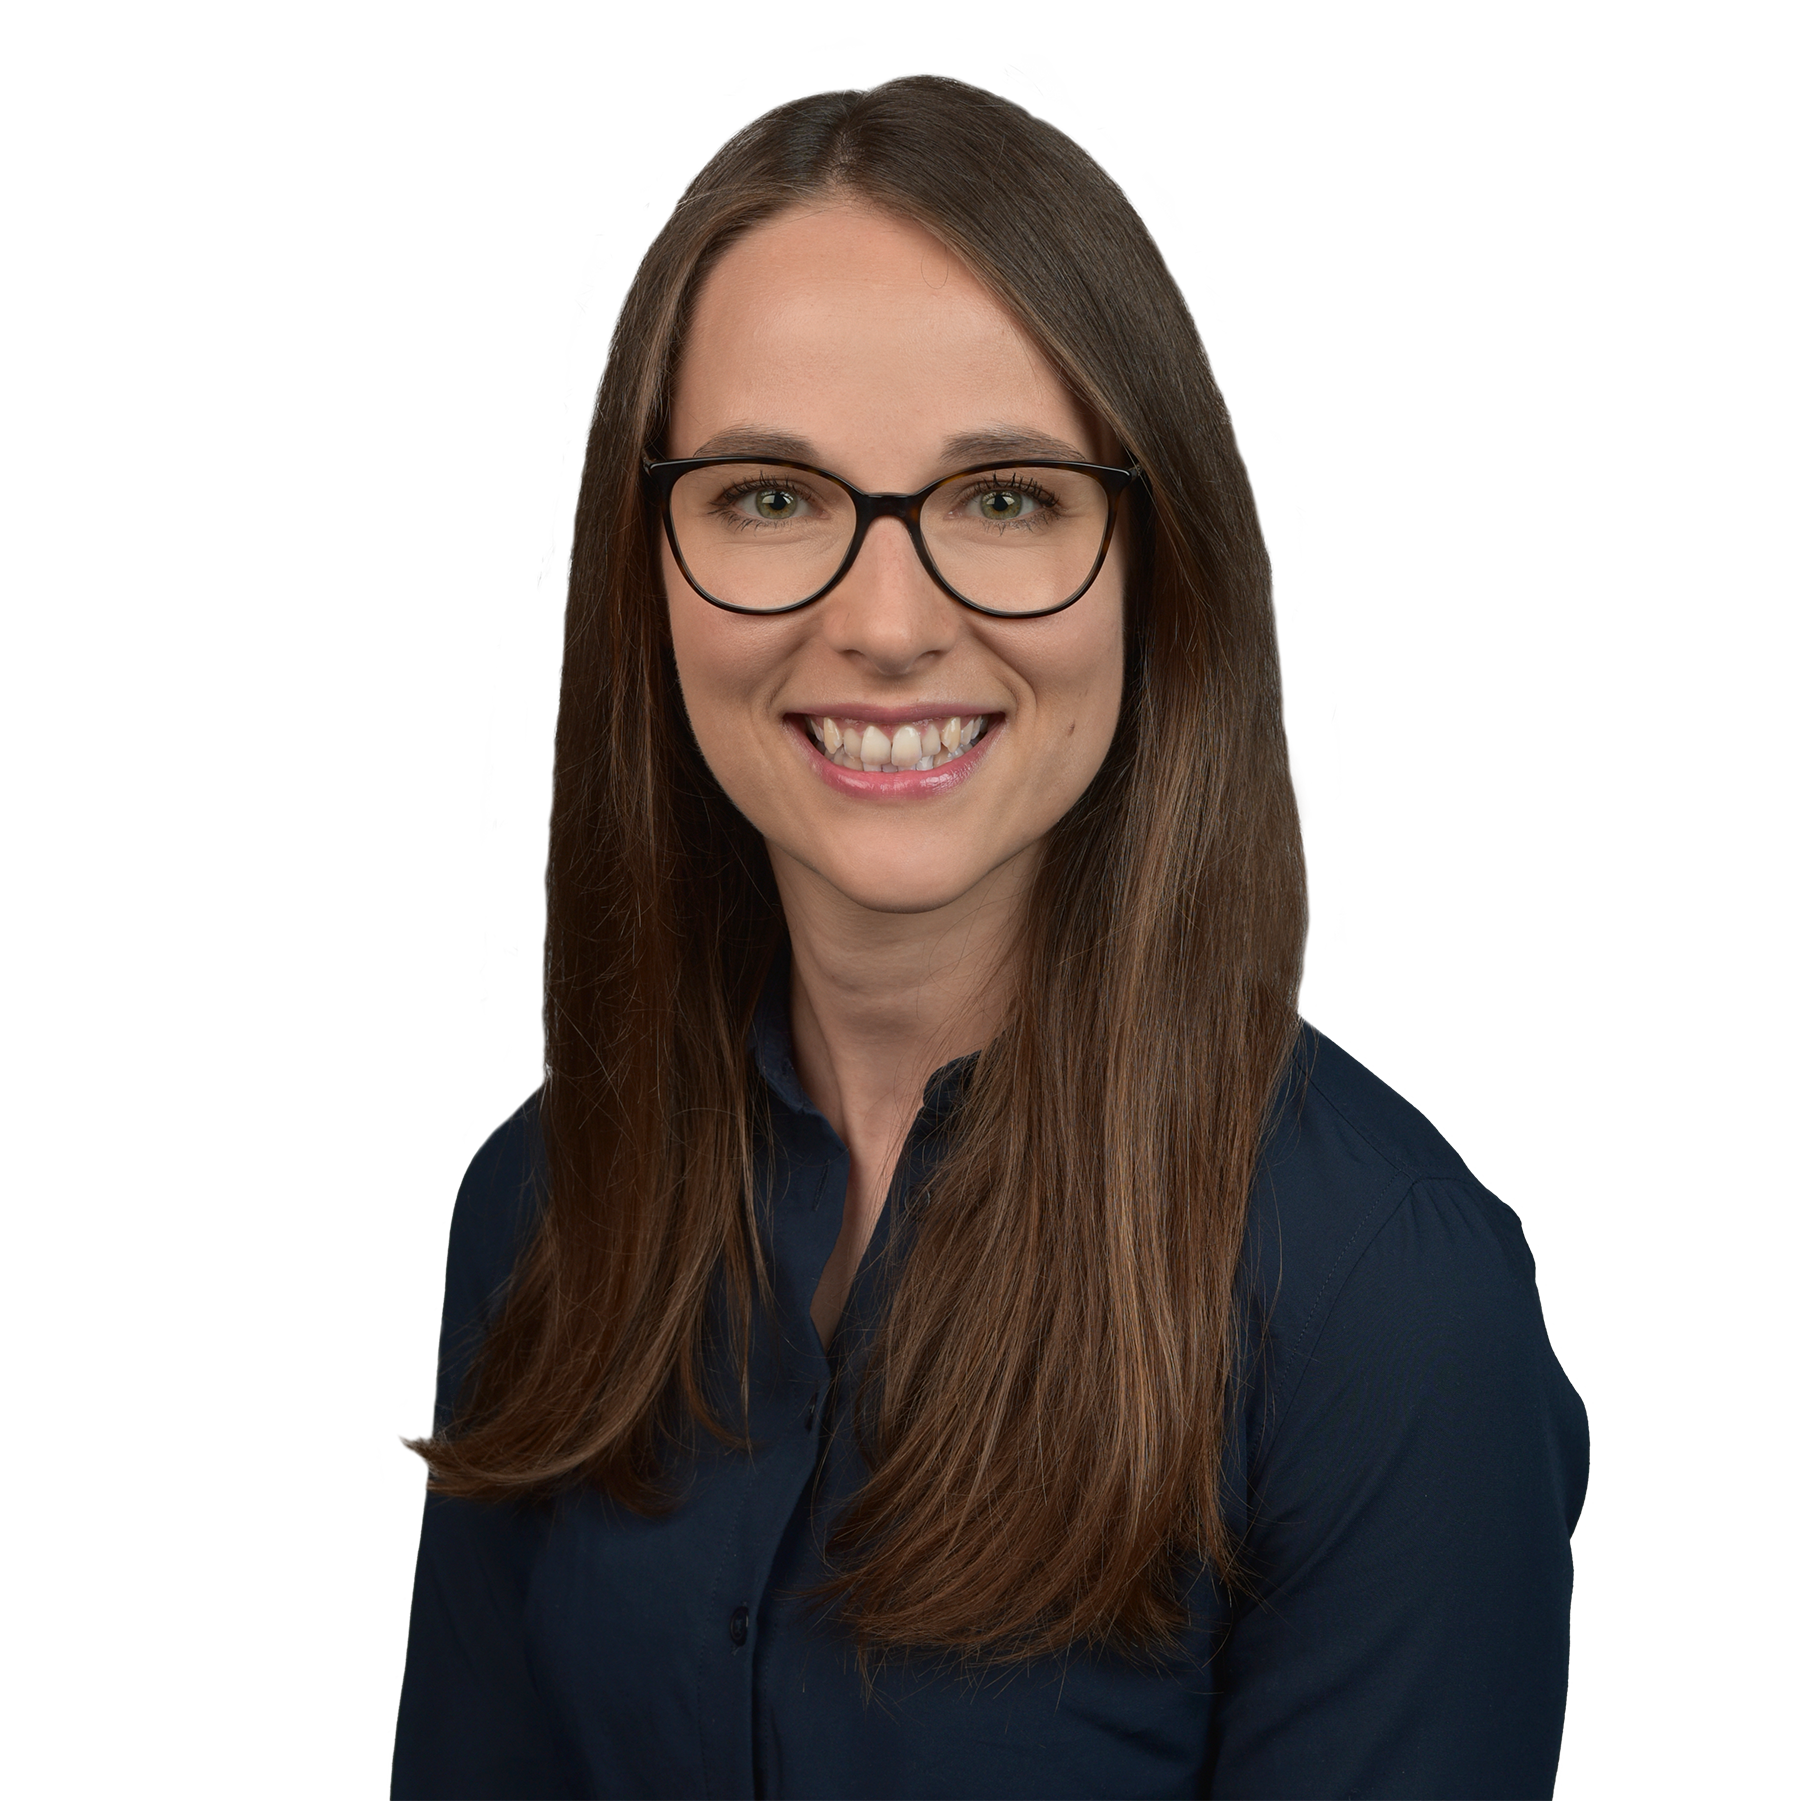 Sophie Müller-Siemens Qurateam